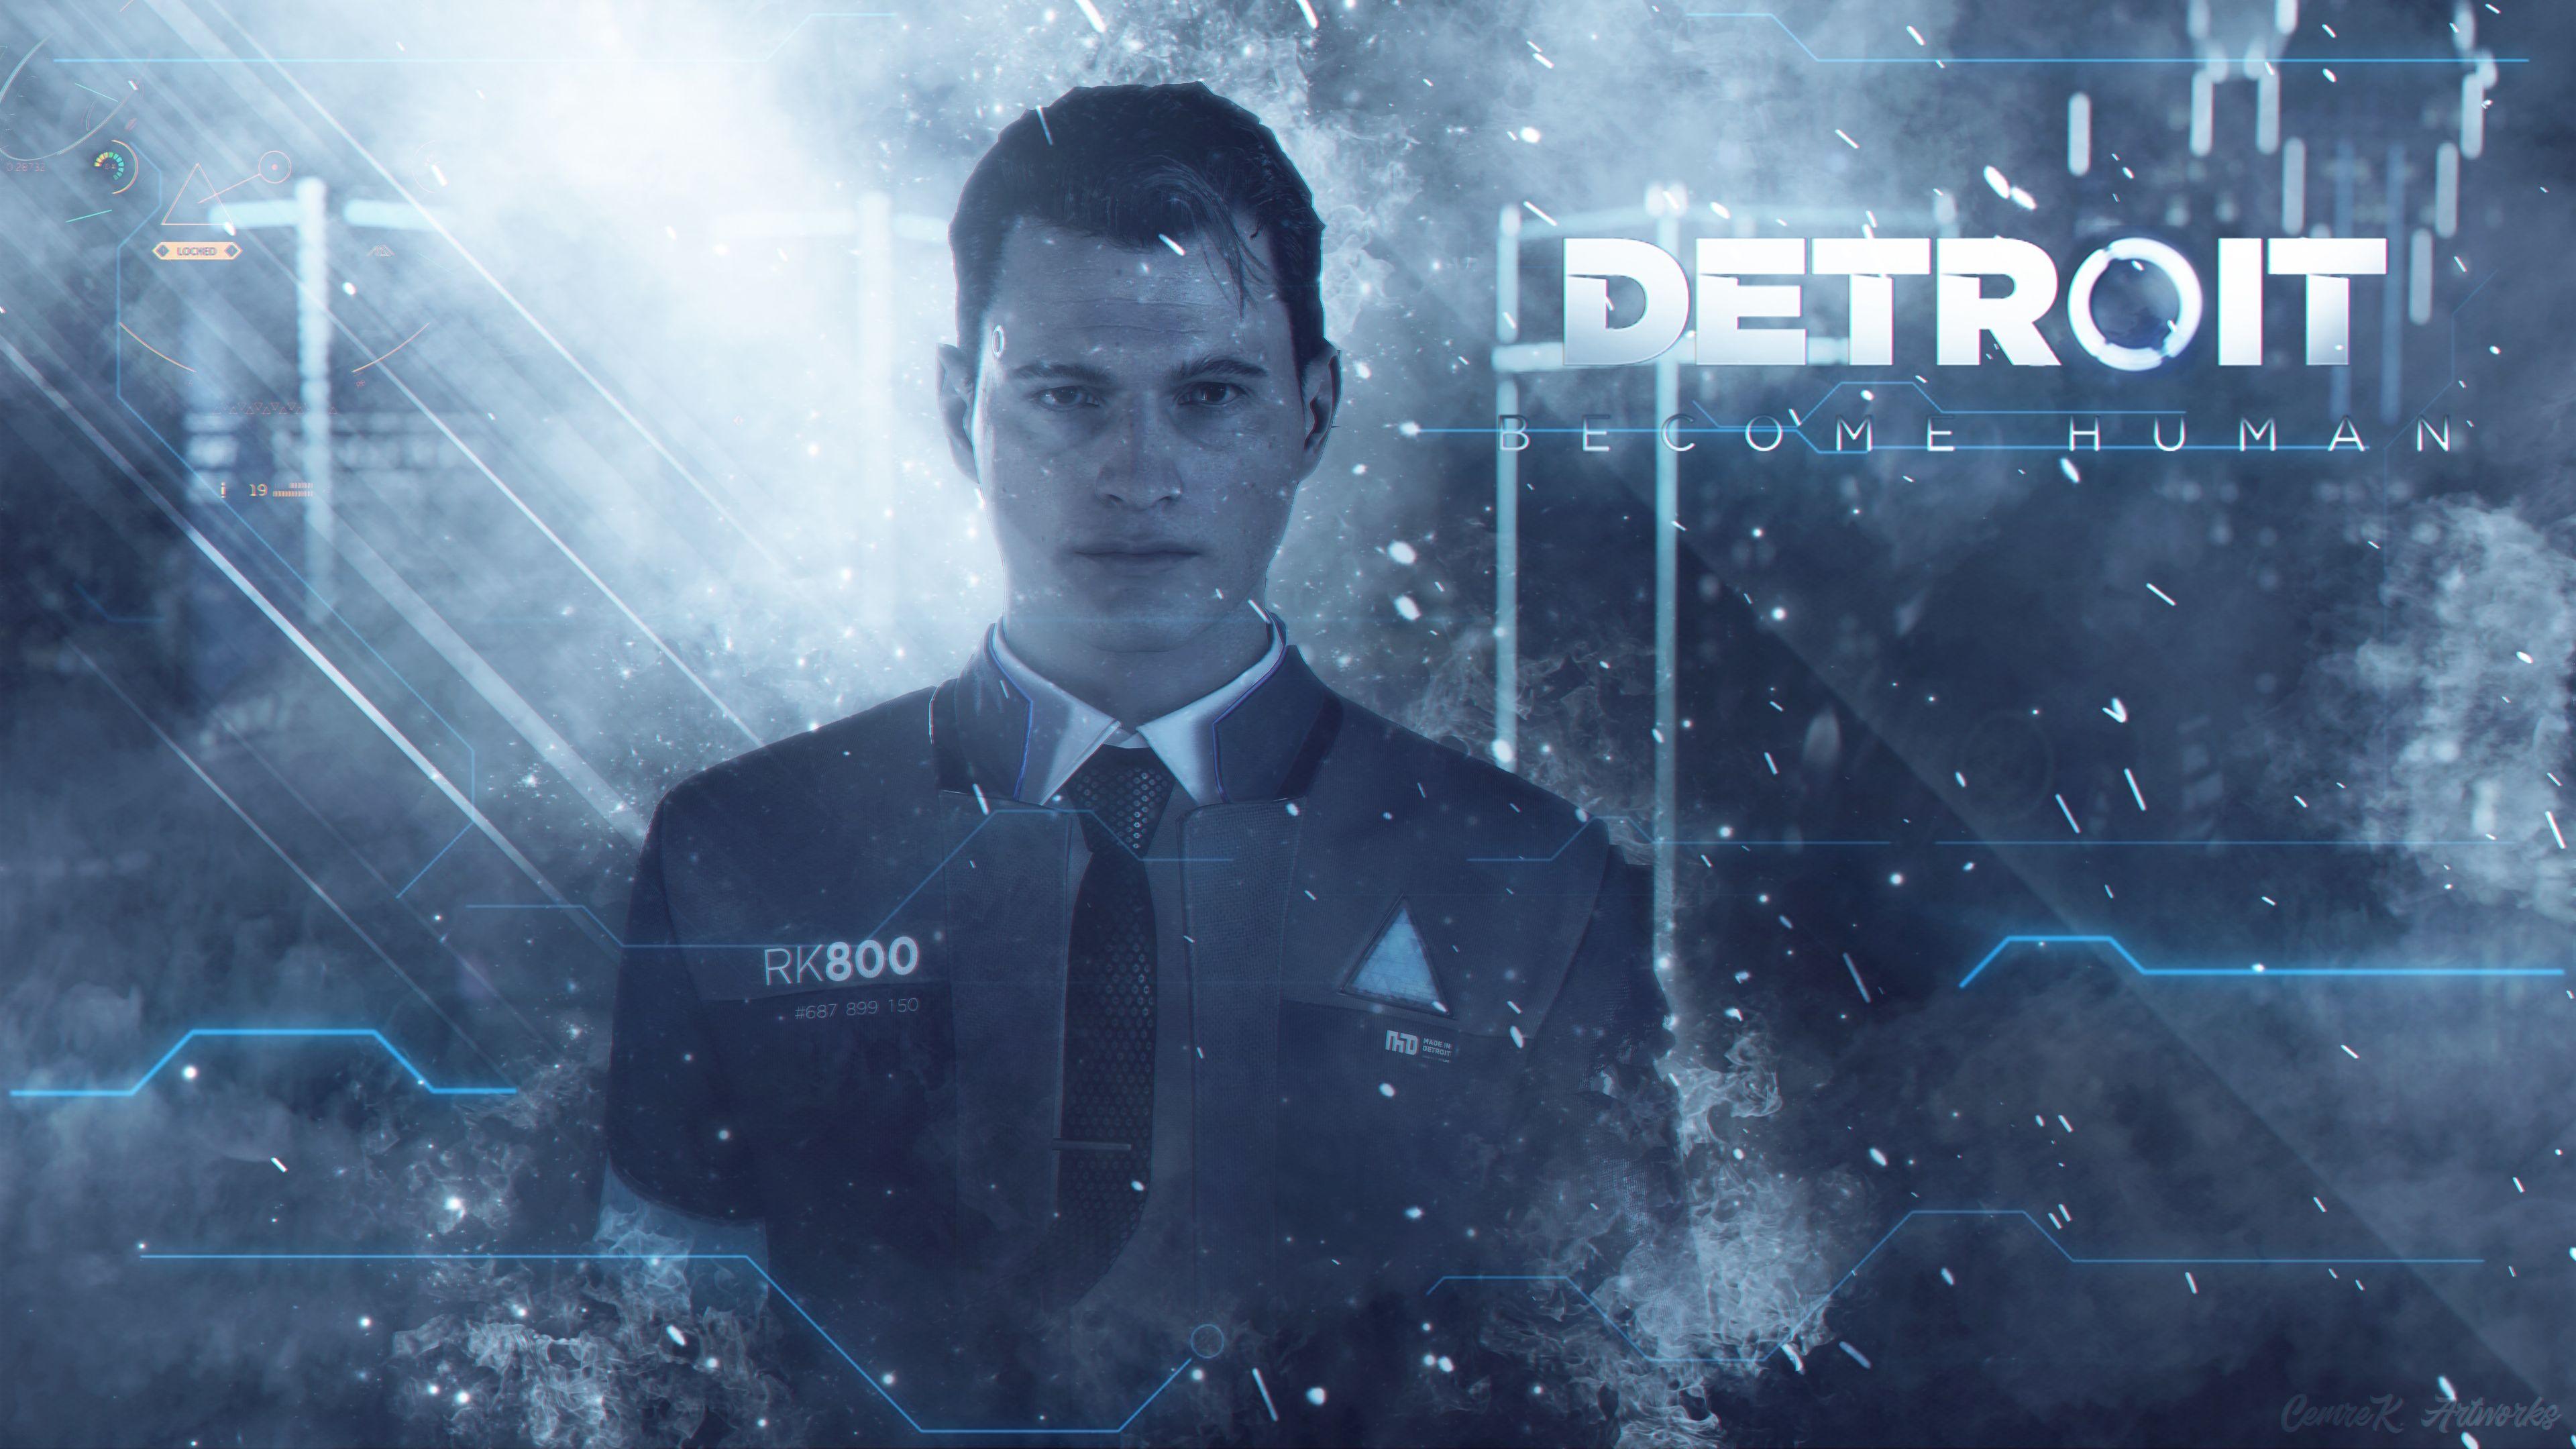 Detroit Human Connor Wallpaper by Cemreksdmr